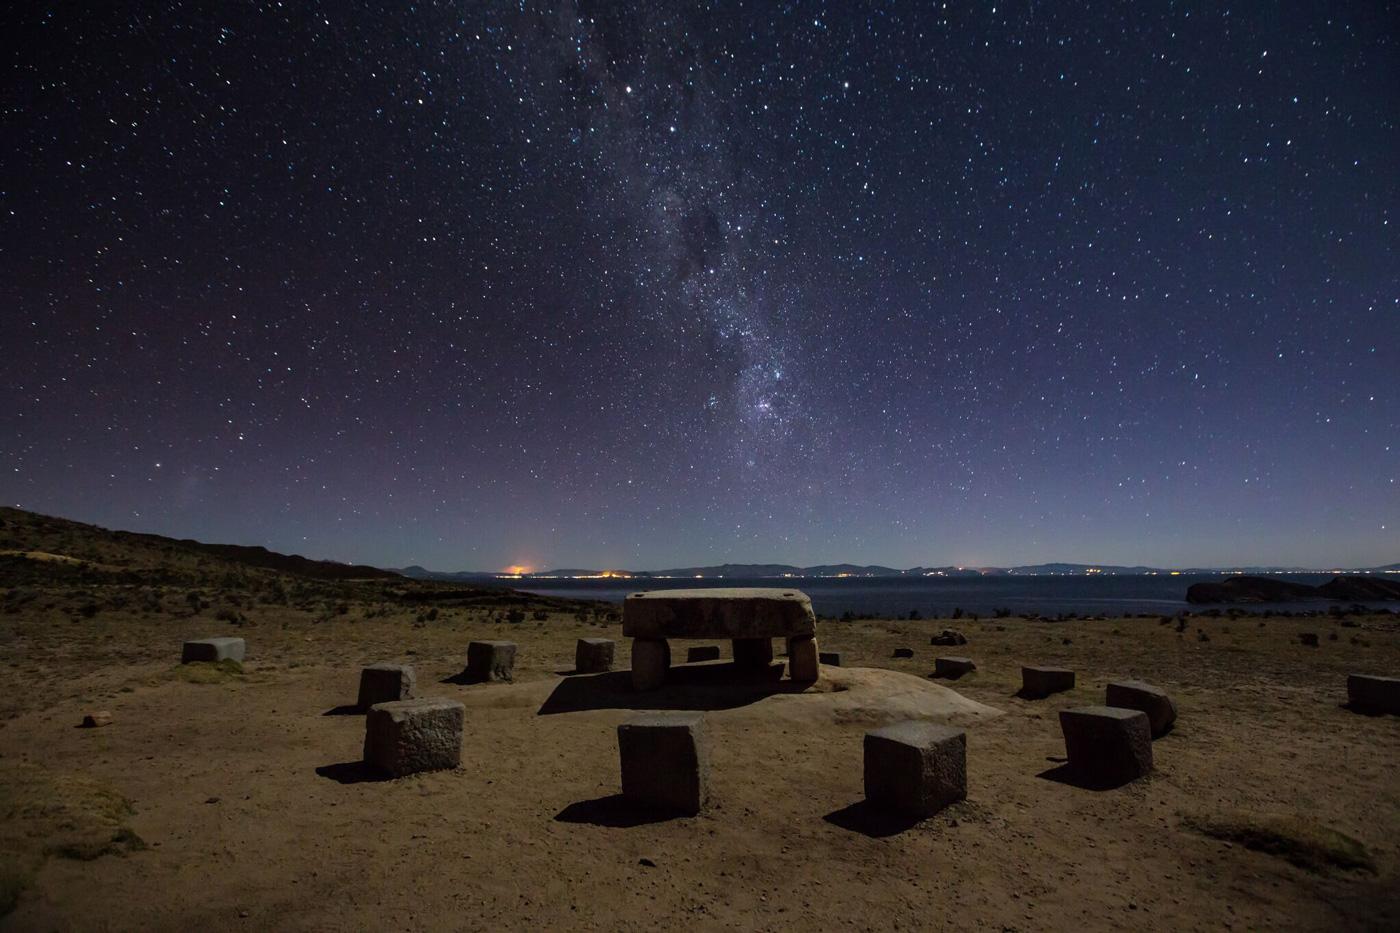 The Milky Way spans the night sky above an Inca sacrificial area near the Santuario on Isla del Sol.